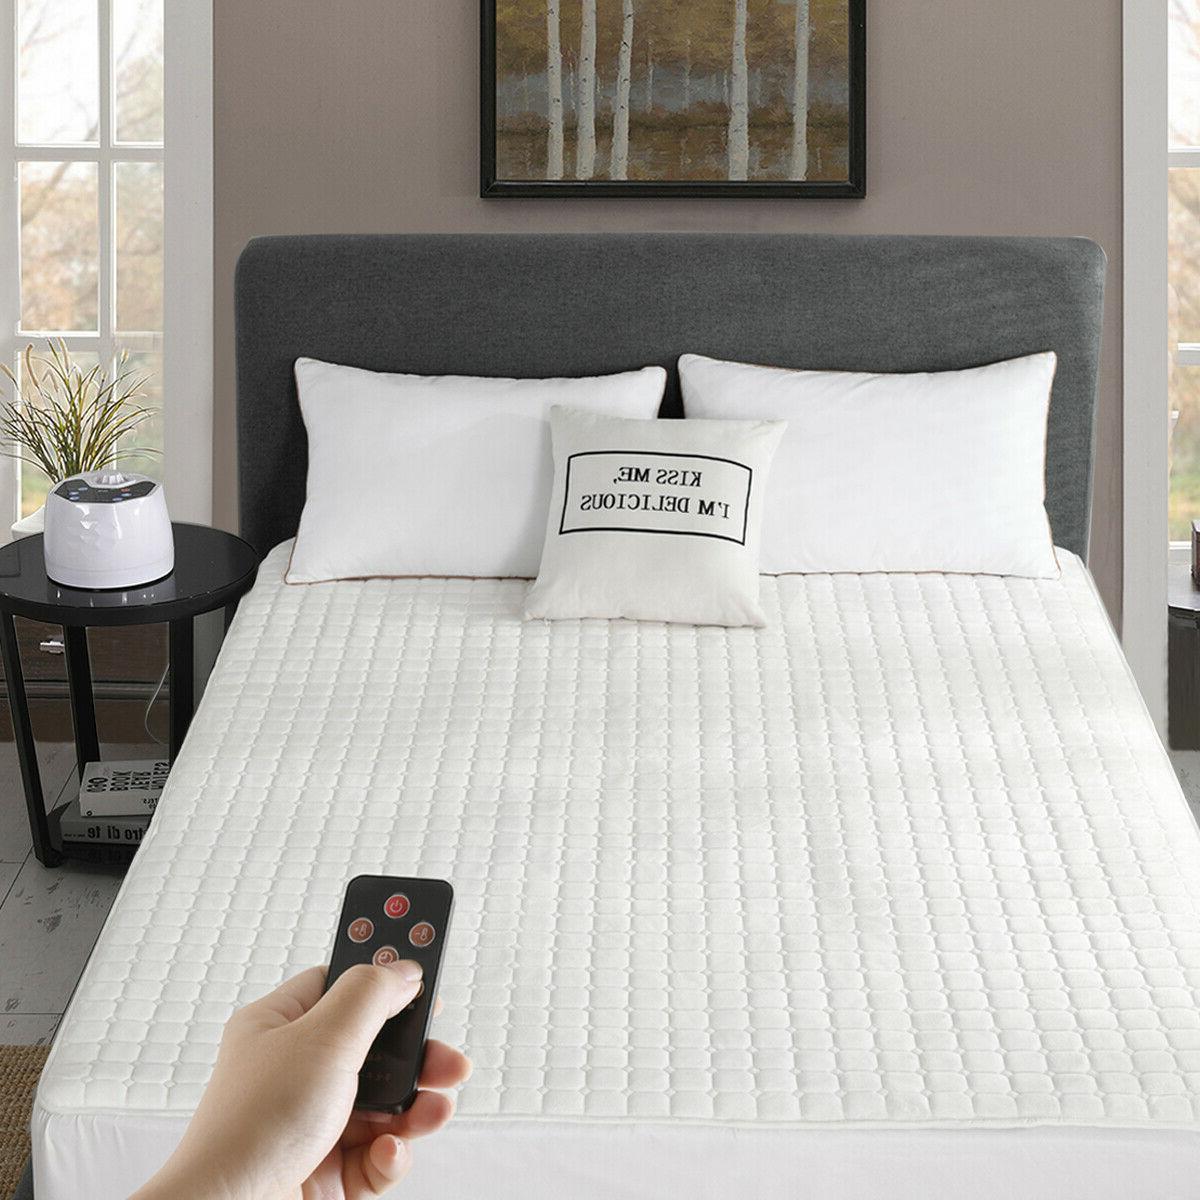 Intelligent Heated Blanket Heating Pad Circulation